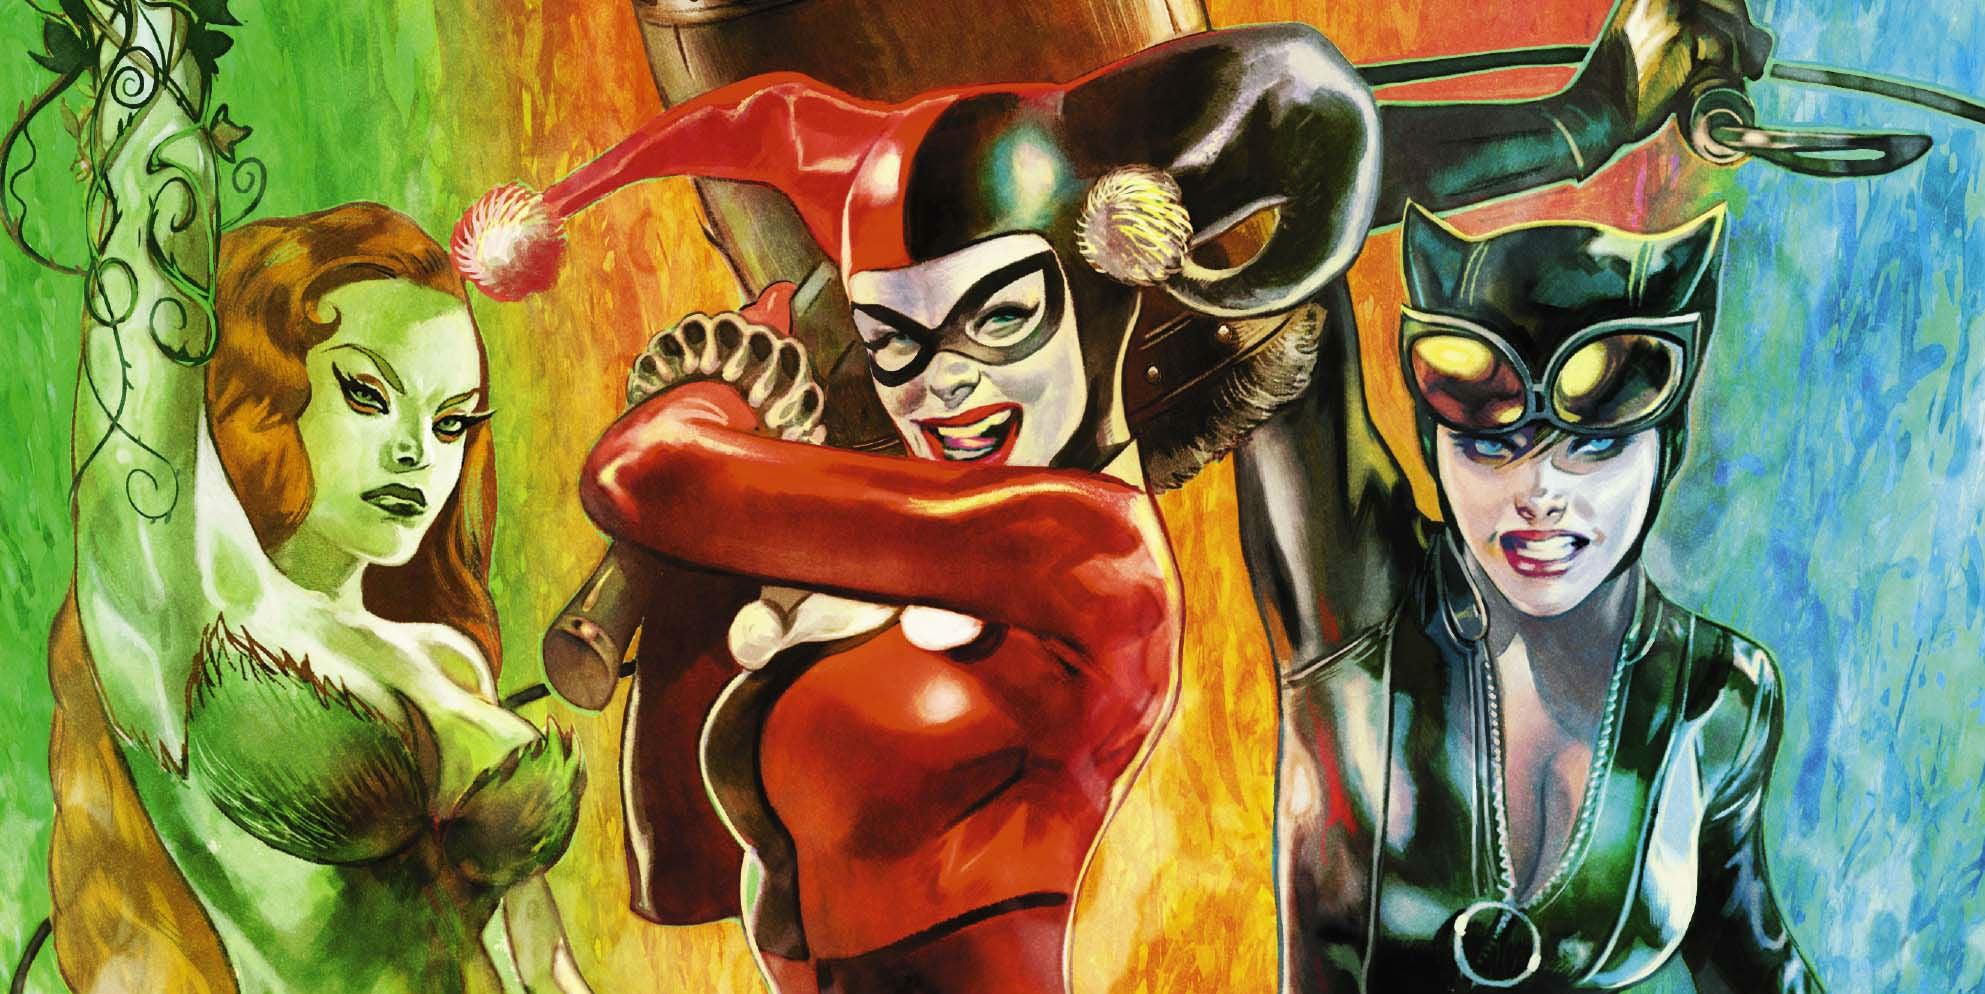 Gotham-City-Sirens-Poison-Ivy-Harley-Quinn-Catwoman